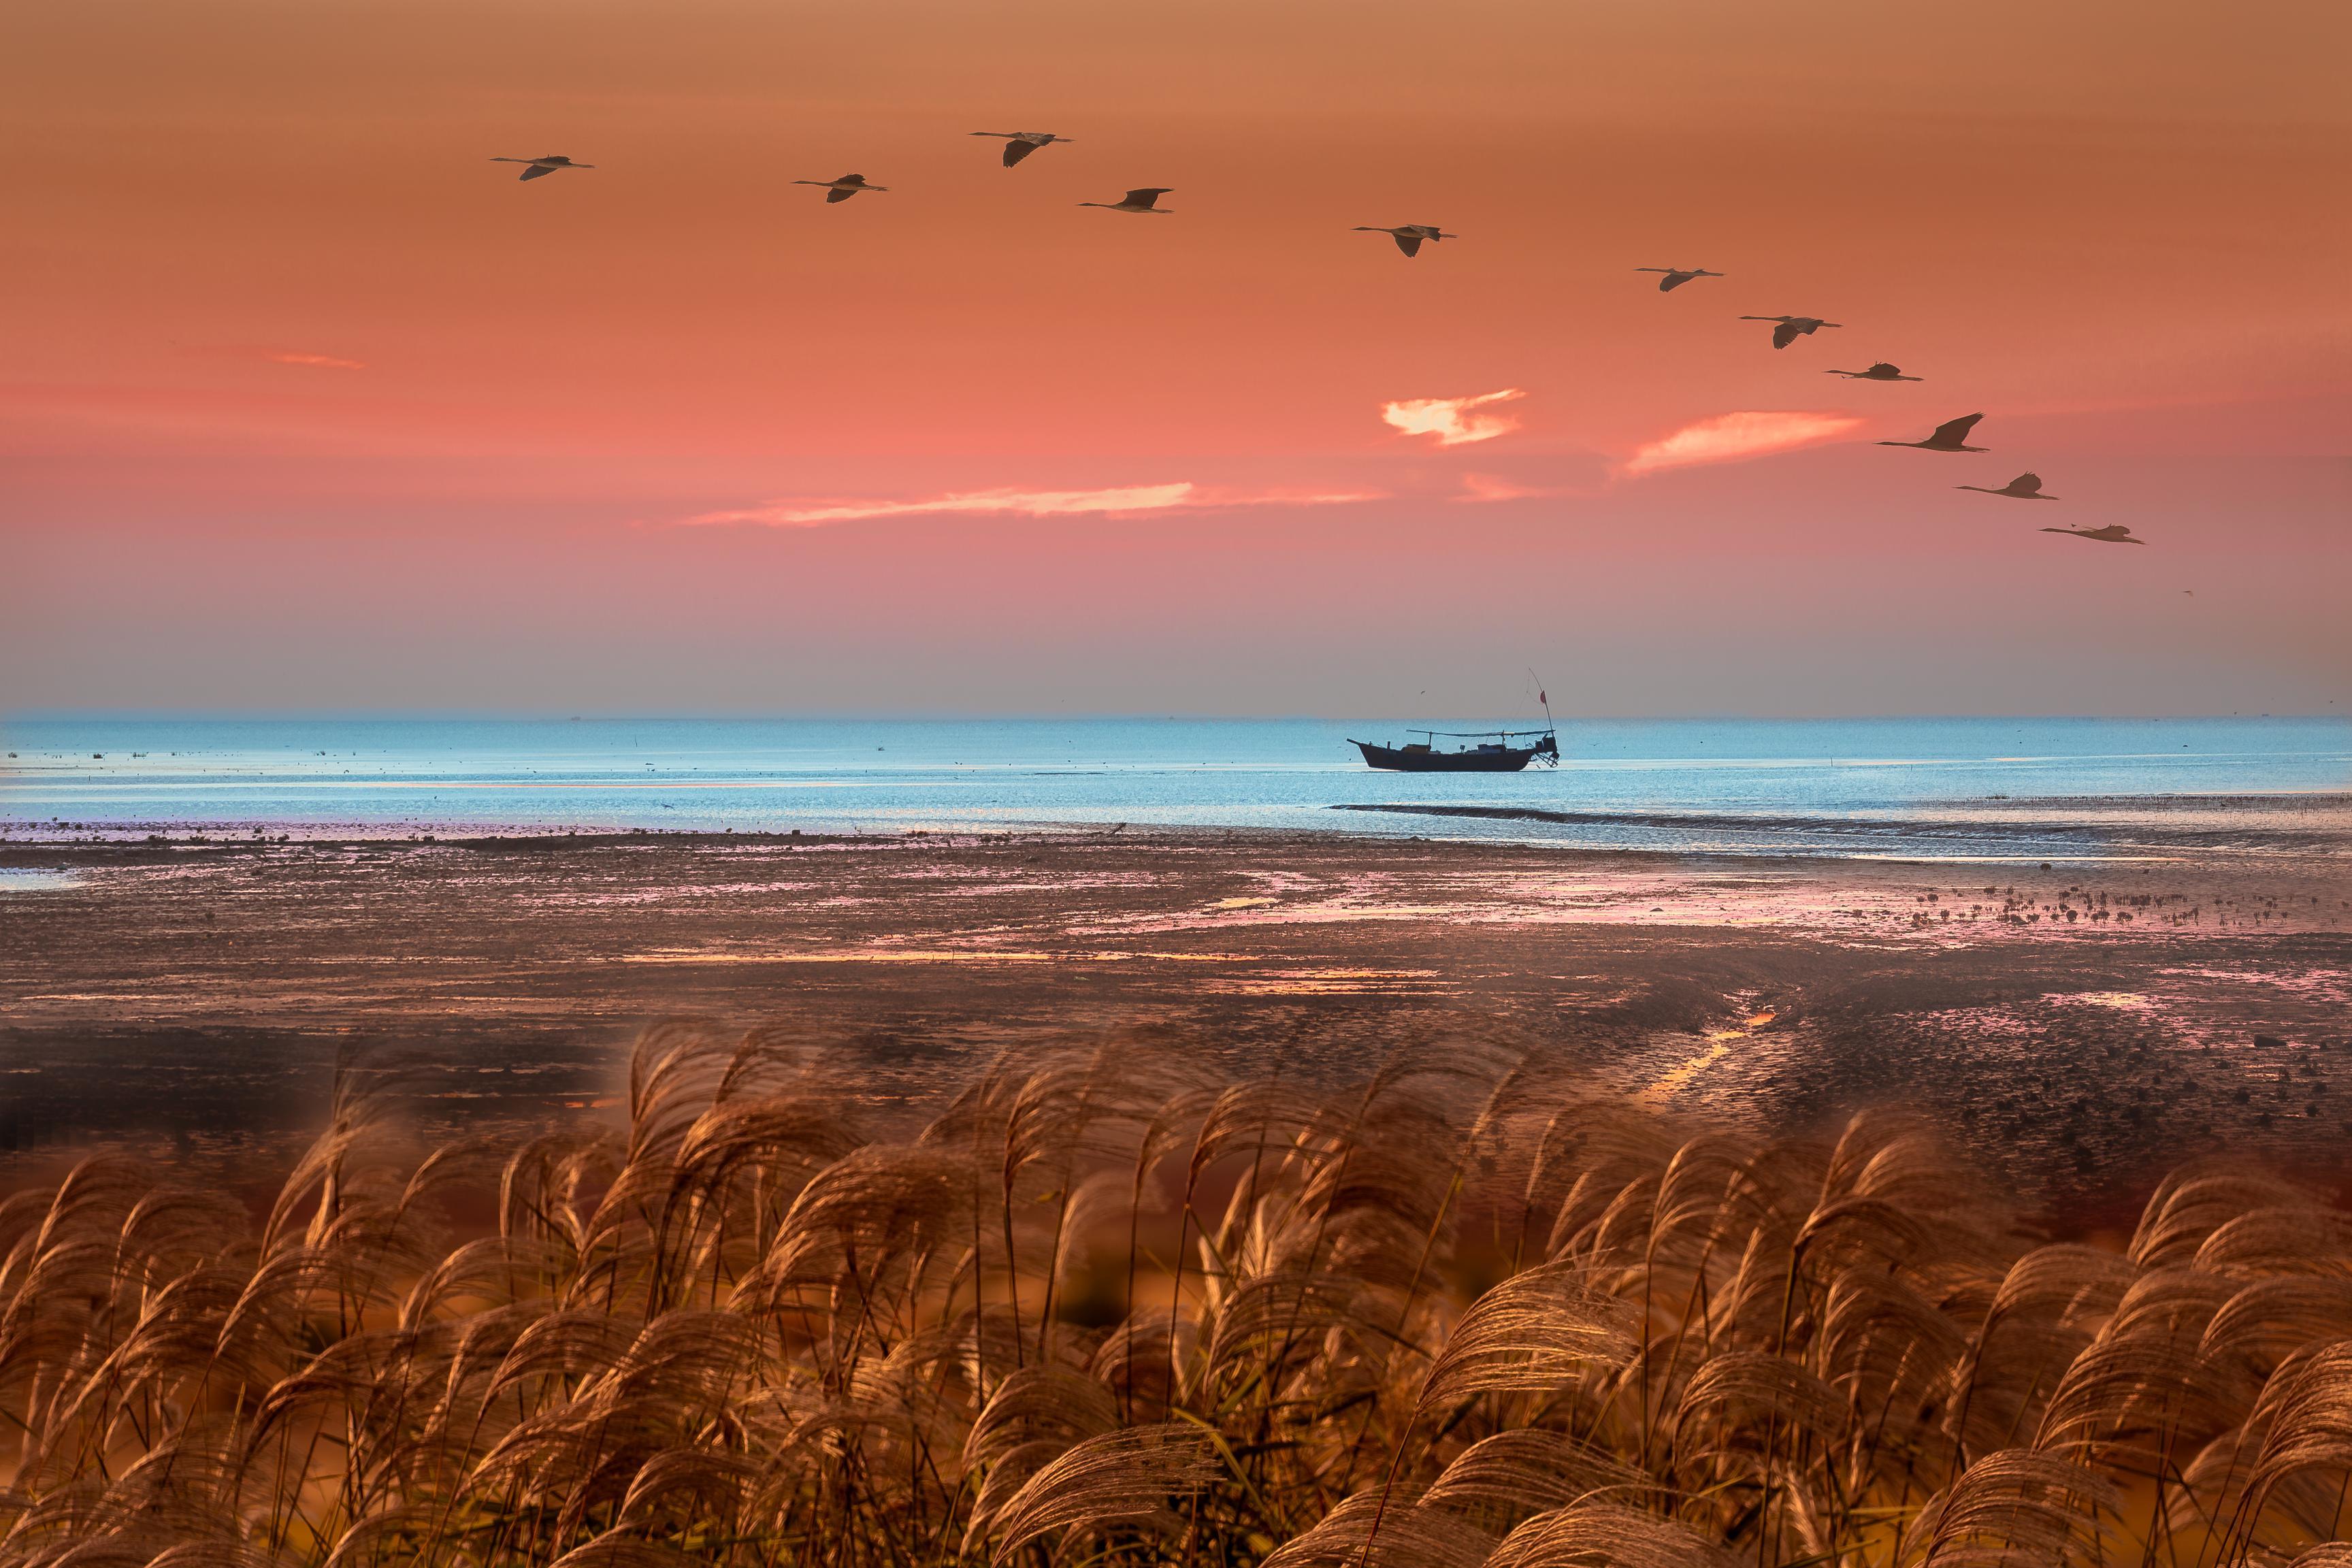 hk_c_7、怪客6 秋風輕撫,揉娑着黃河入海口這片濕地,孤影遠帆在這年輕的土地上靜靜的守候,期待着明天的啟航。.jpg